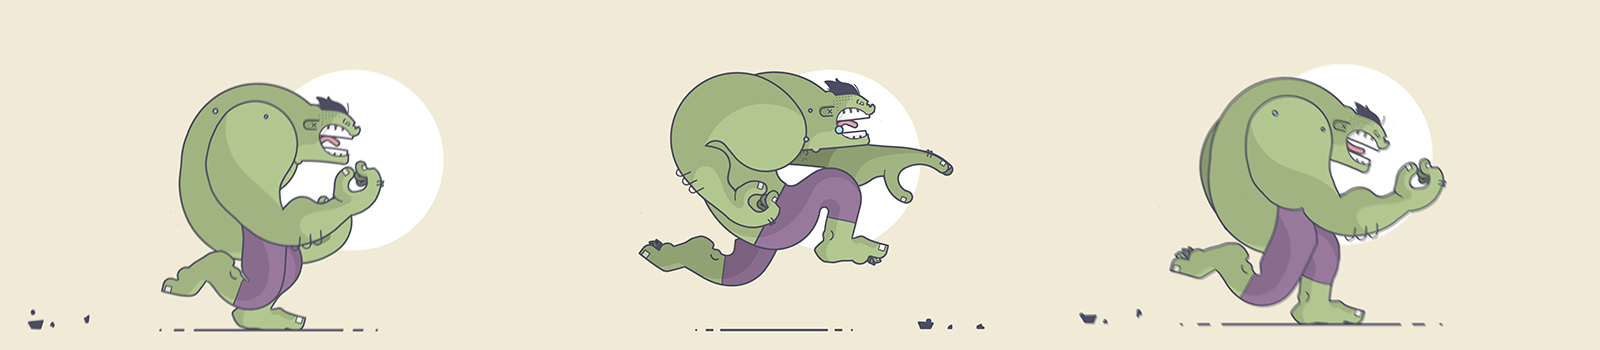 Chris-Fernandez-Hulk-Run-Banner